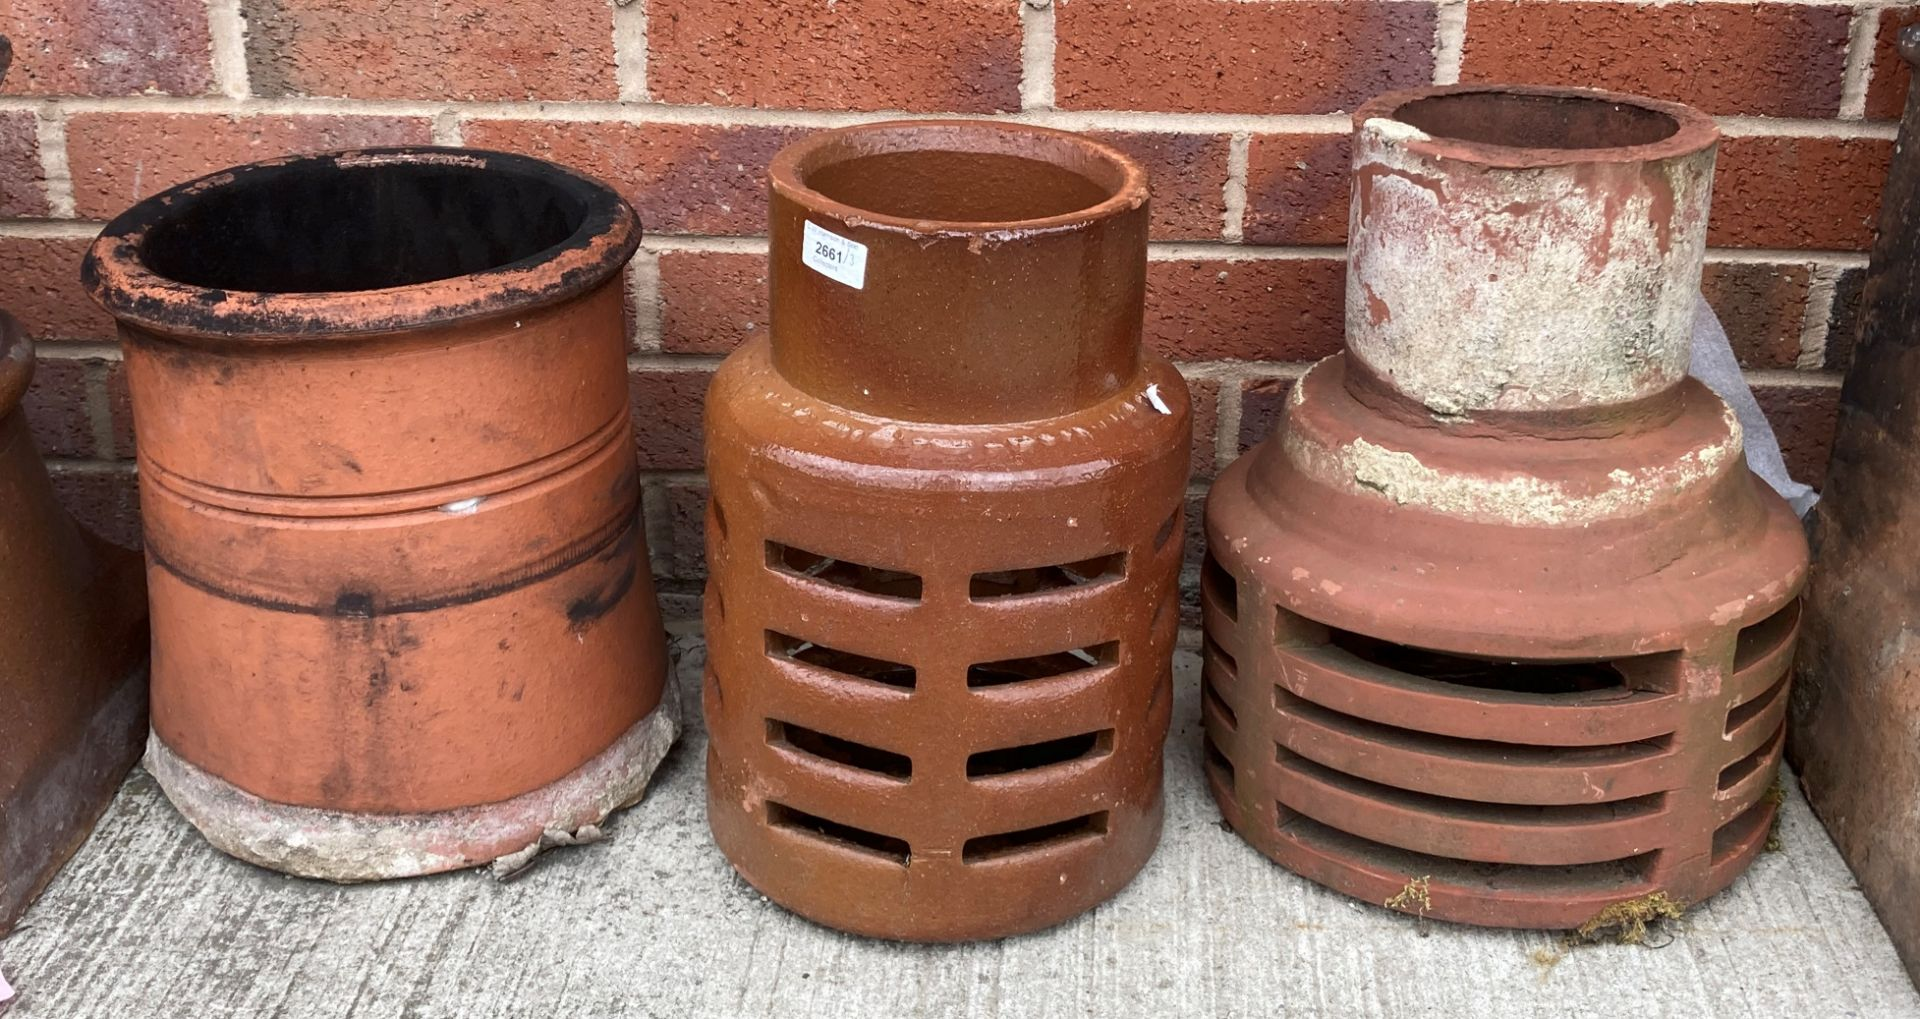 Three low salt glazed/terracotta chimney top pots - different styles size range 30-40cm high